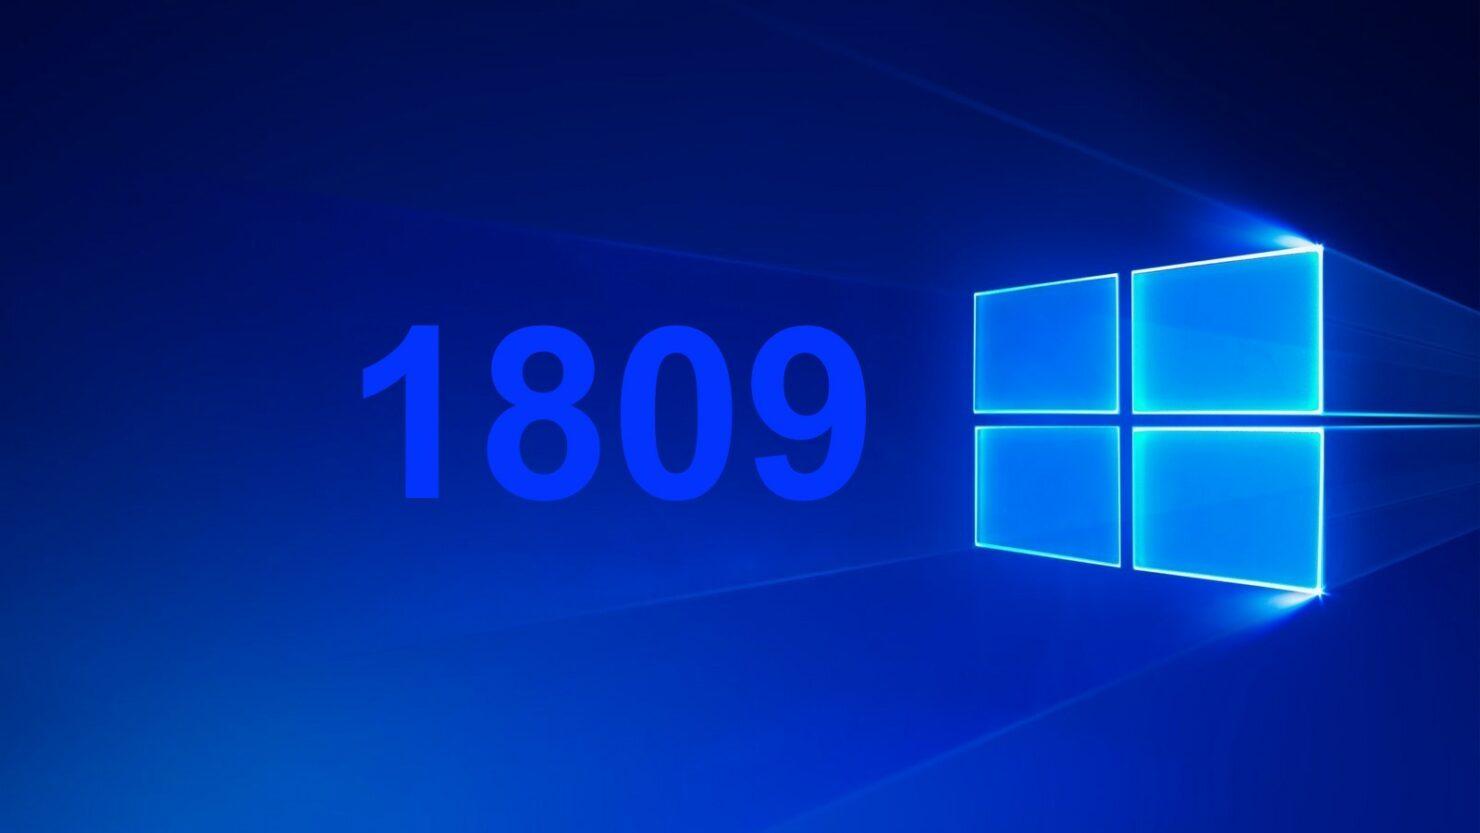 windows 10 1809 bugs download Windows 10 October 2018 Update windows 10 1809